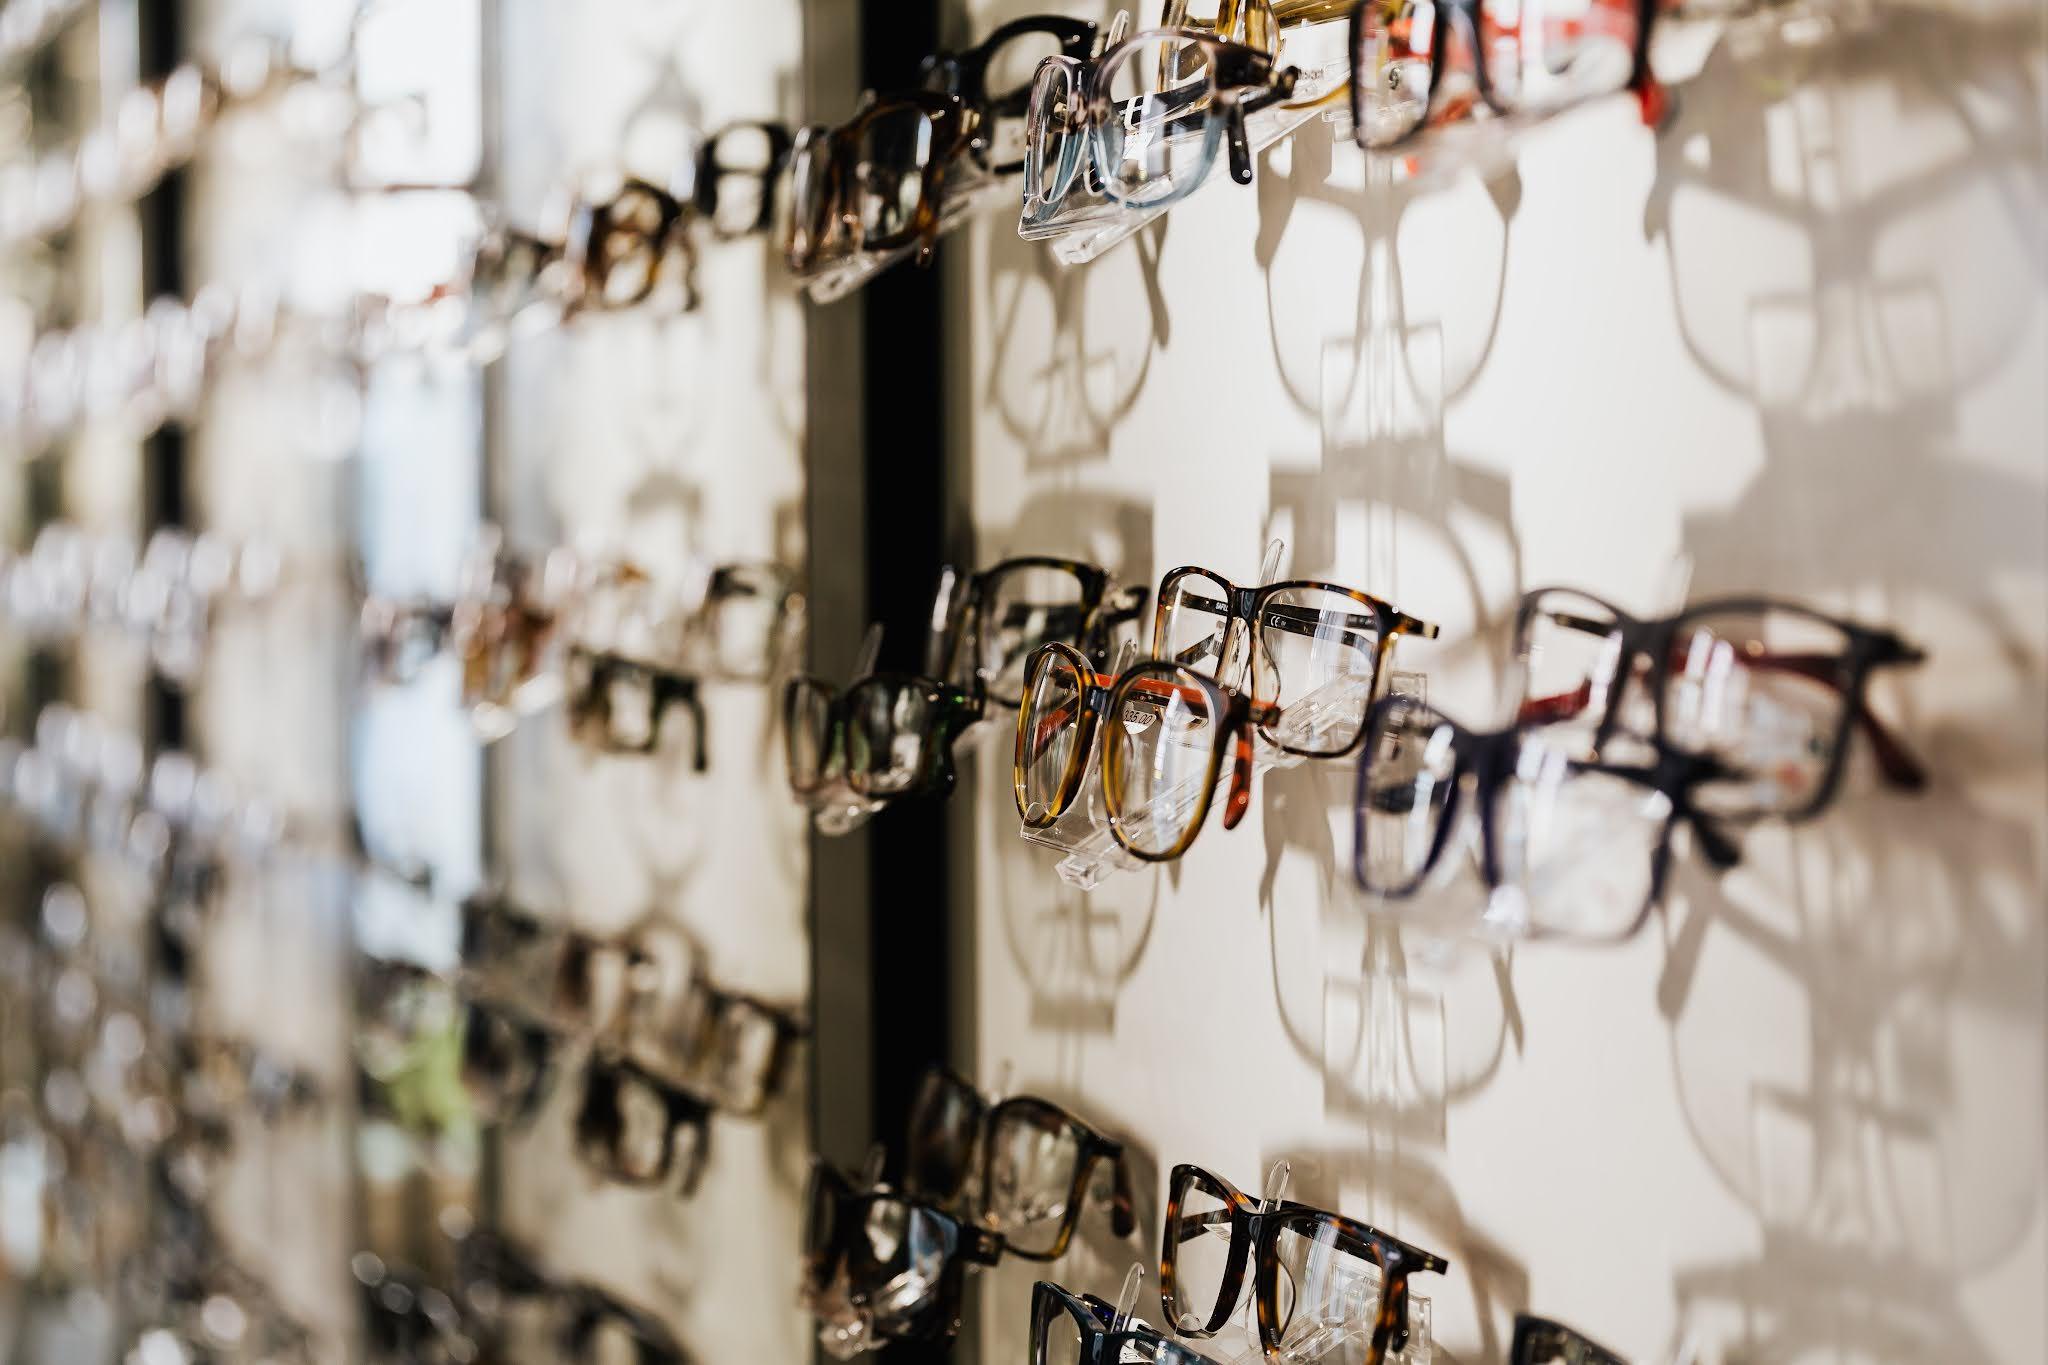 a range of glasses in an opticians. Image free stock image from Pexels by Karolina Grabowska